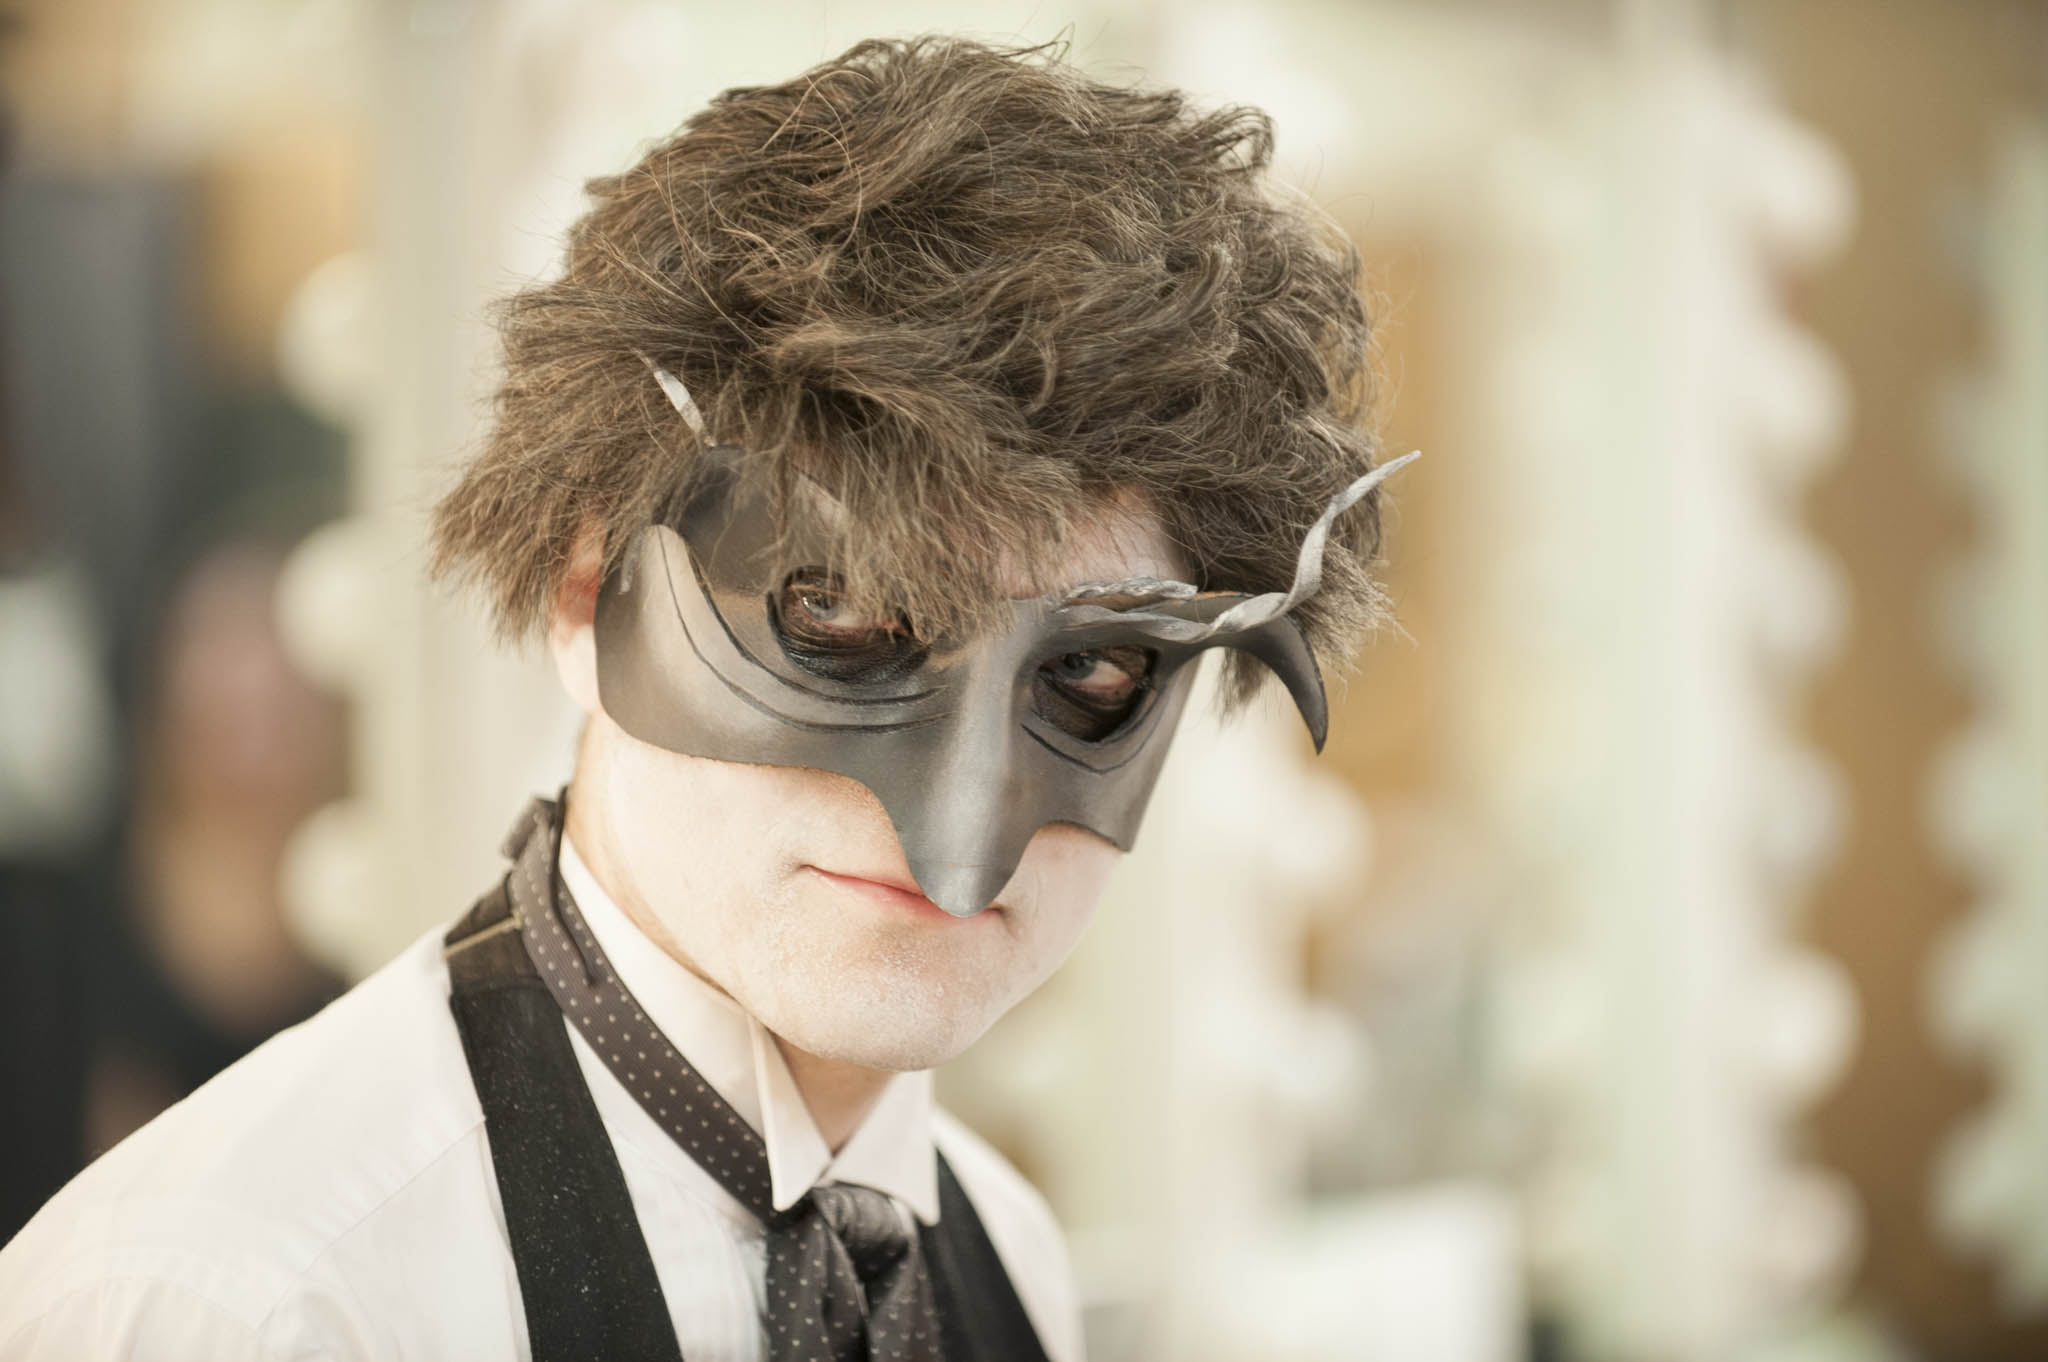 STAR // Connor Gibson    Hummel's servant Johansson (Tom Ward) and his menacing black masquerade mask.